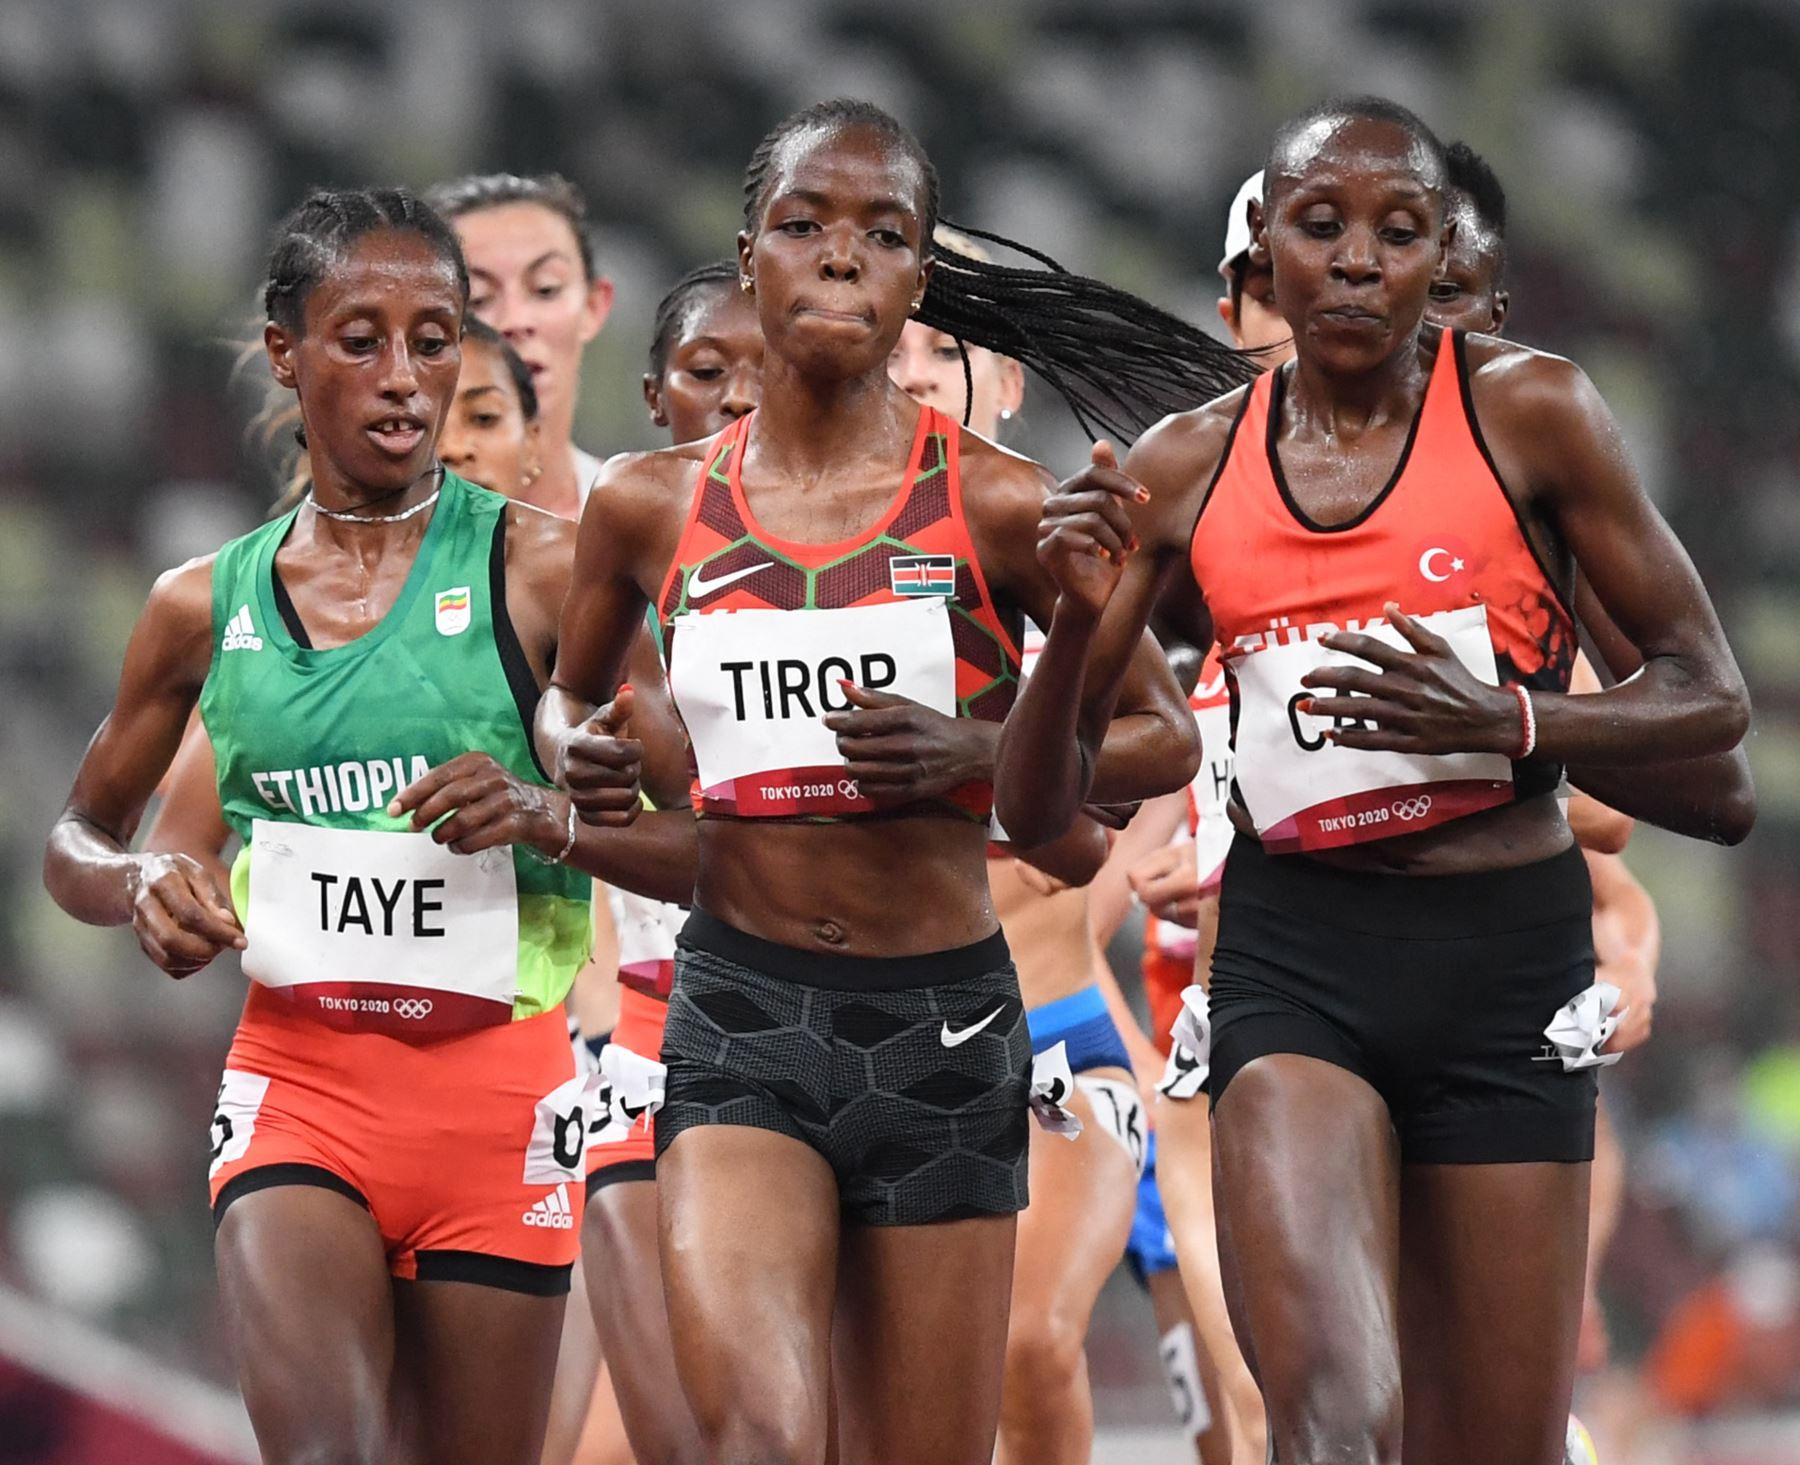 La atleta keniana Agnes Tirop, apuñalada a muerte en su país